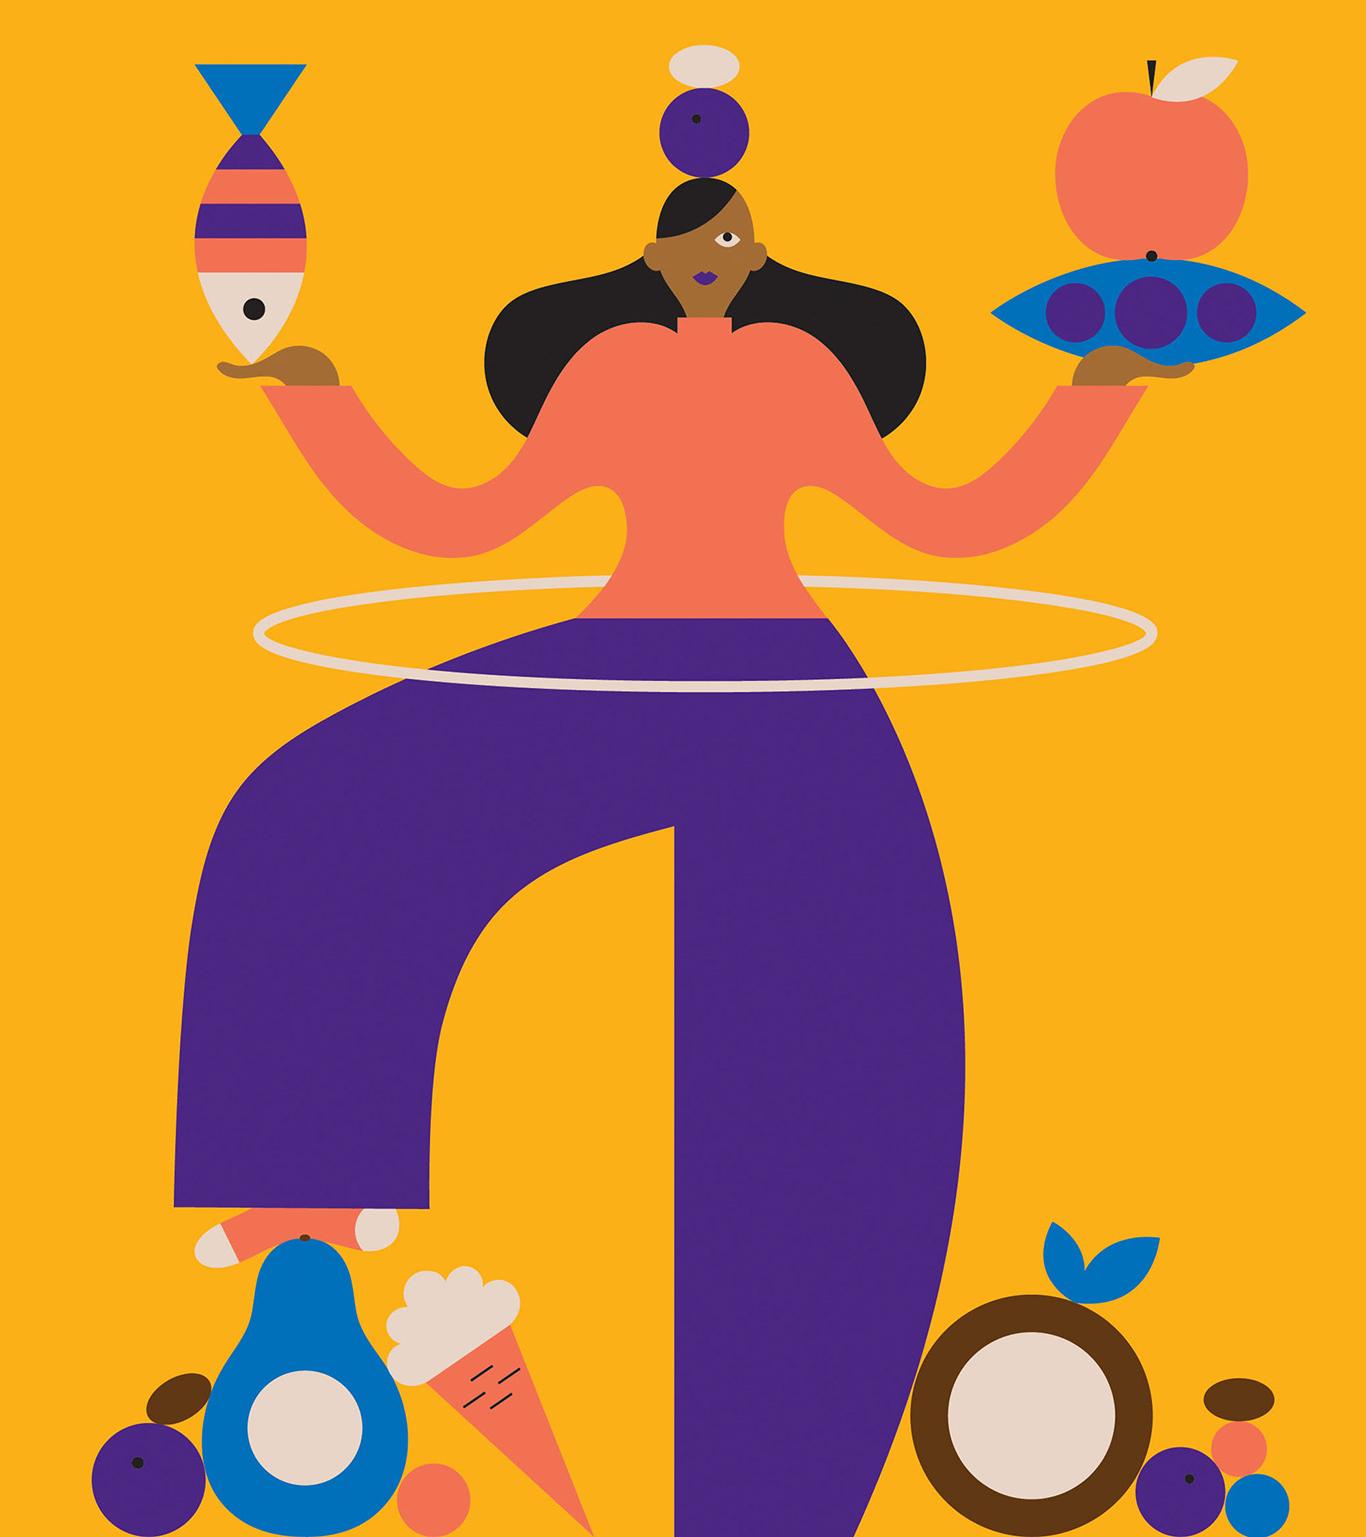 renew illustration woman balancing diet